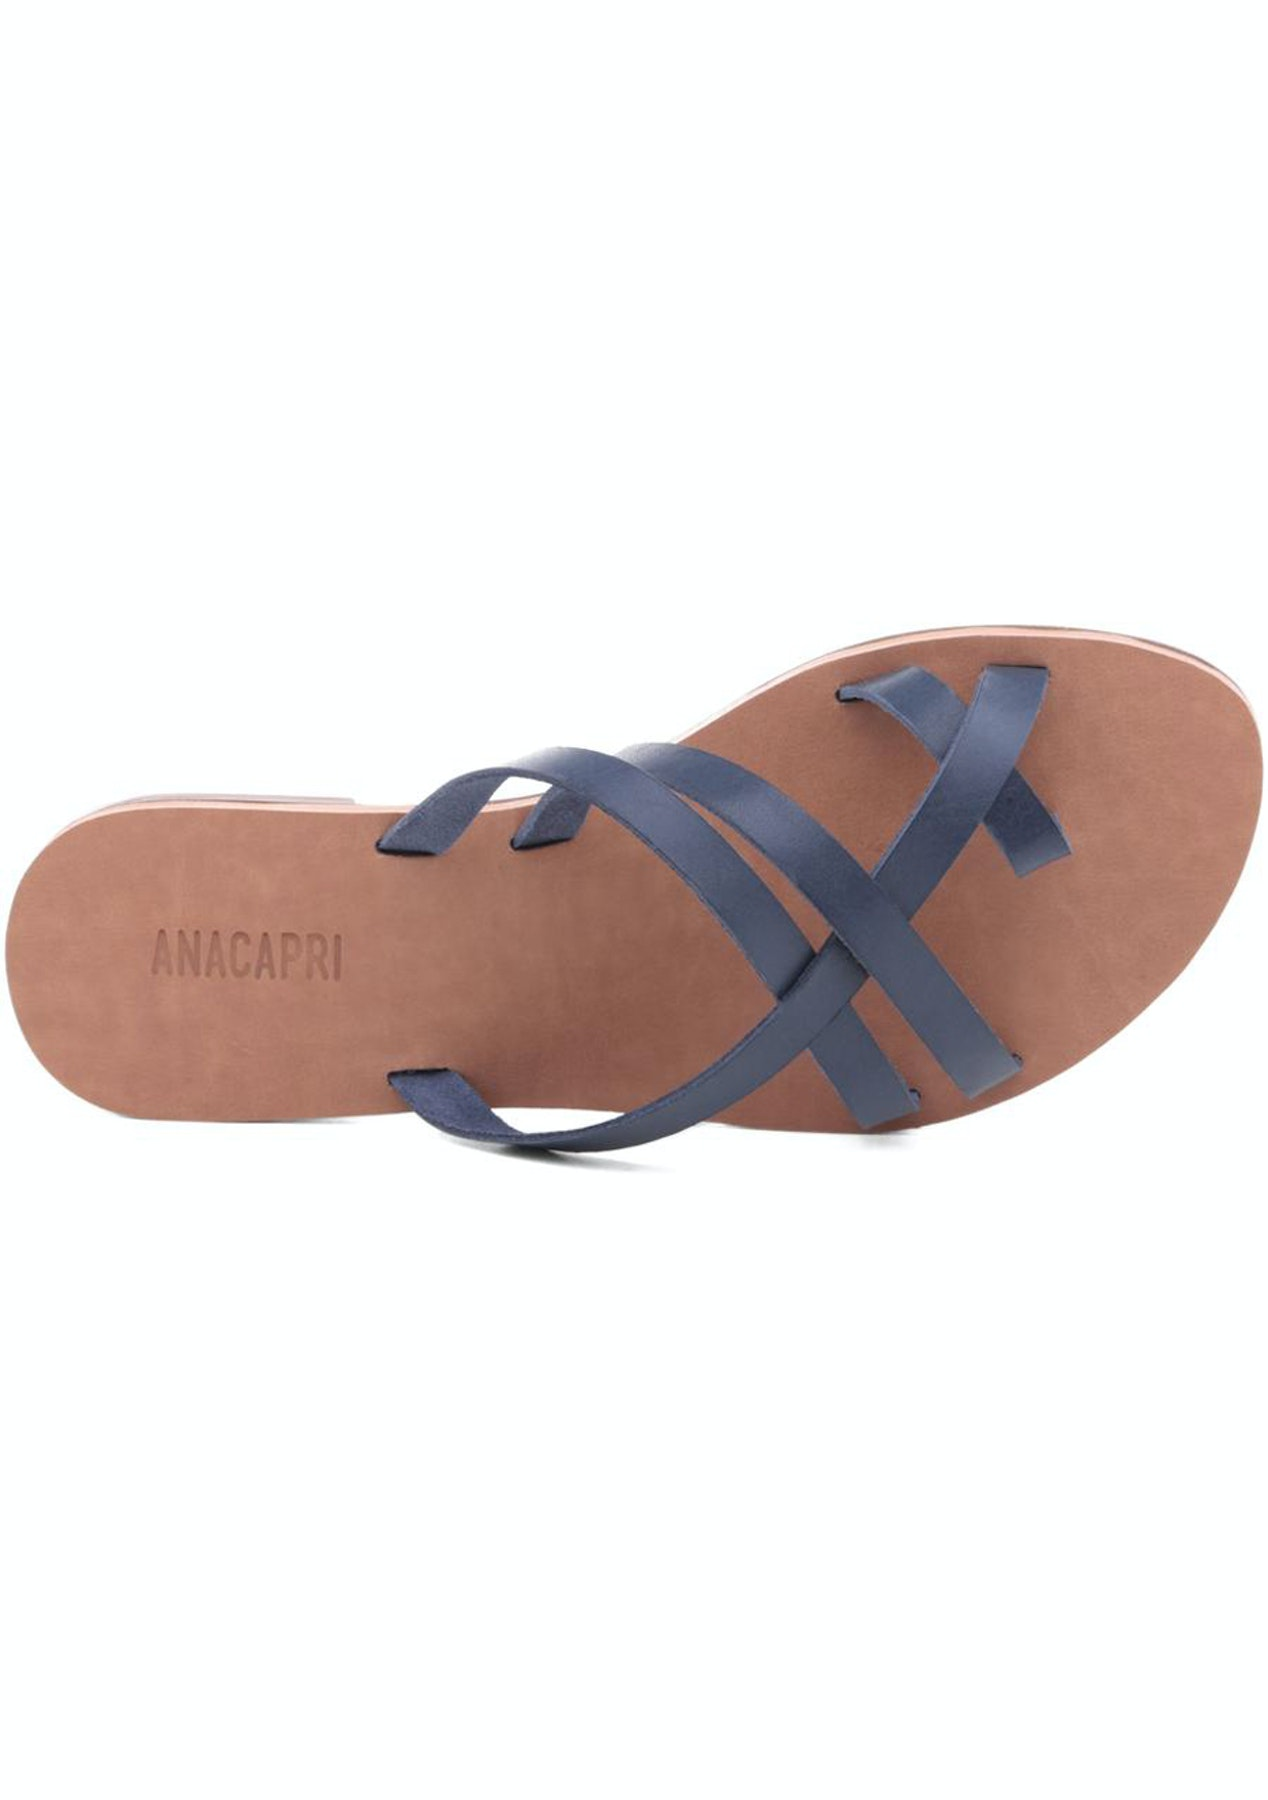 ceeb1ff79899 Anacapri - Flat Slim Navy - Under  60 Shoes - Onceit